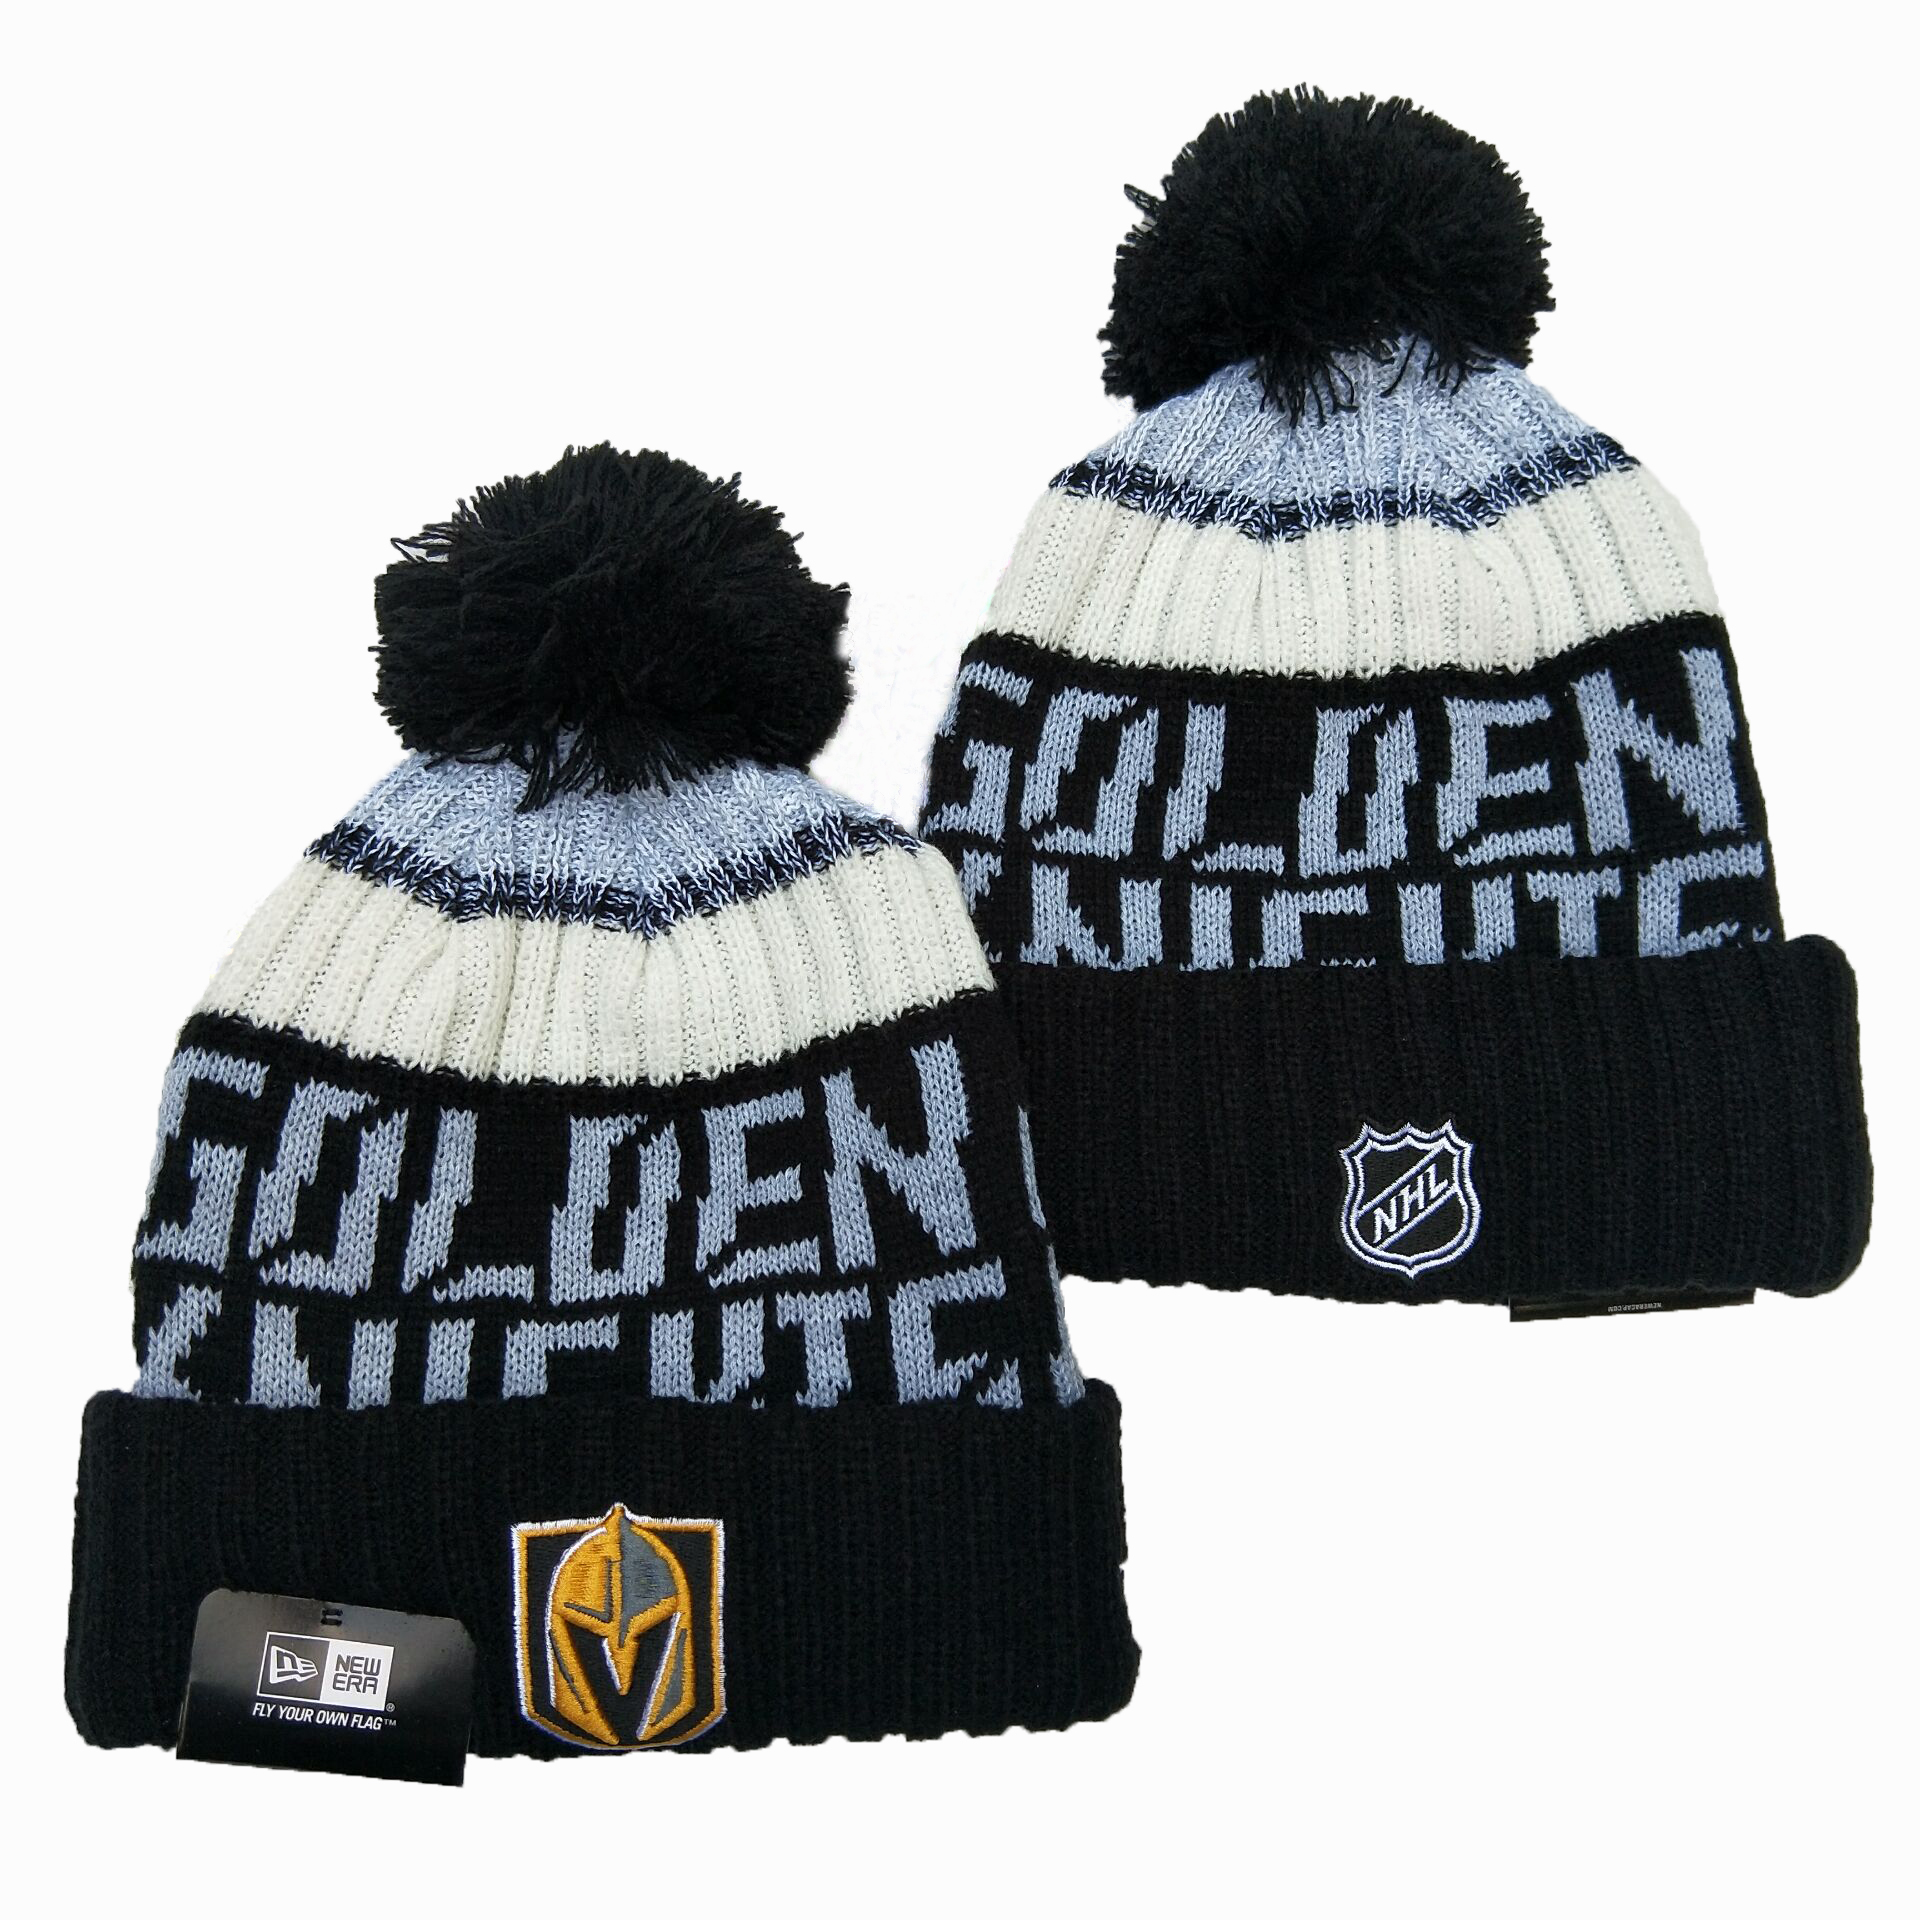 Vegas Golden Knights Team Logo Black Pom Knit Hat YD